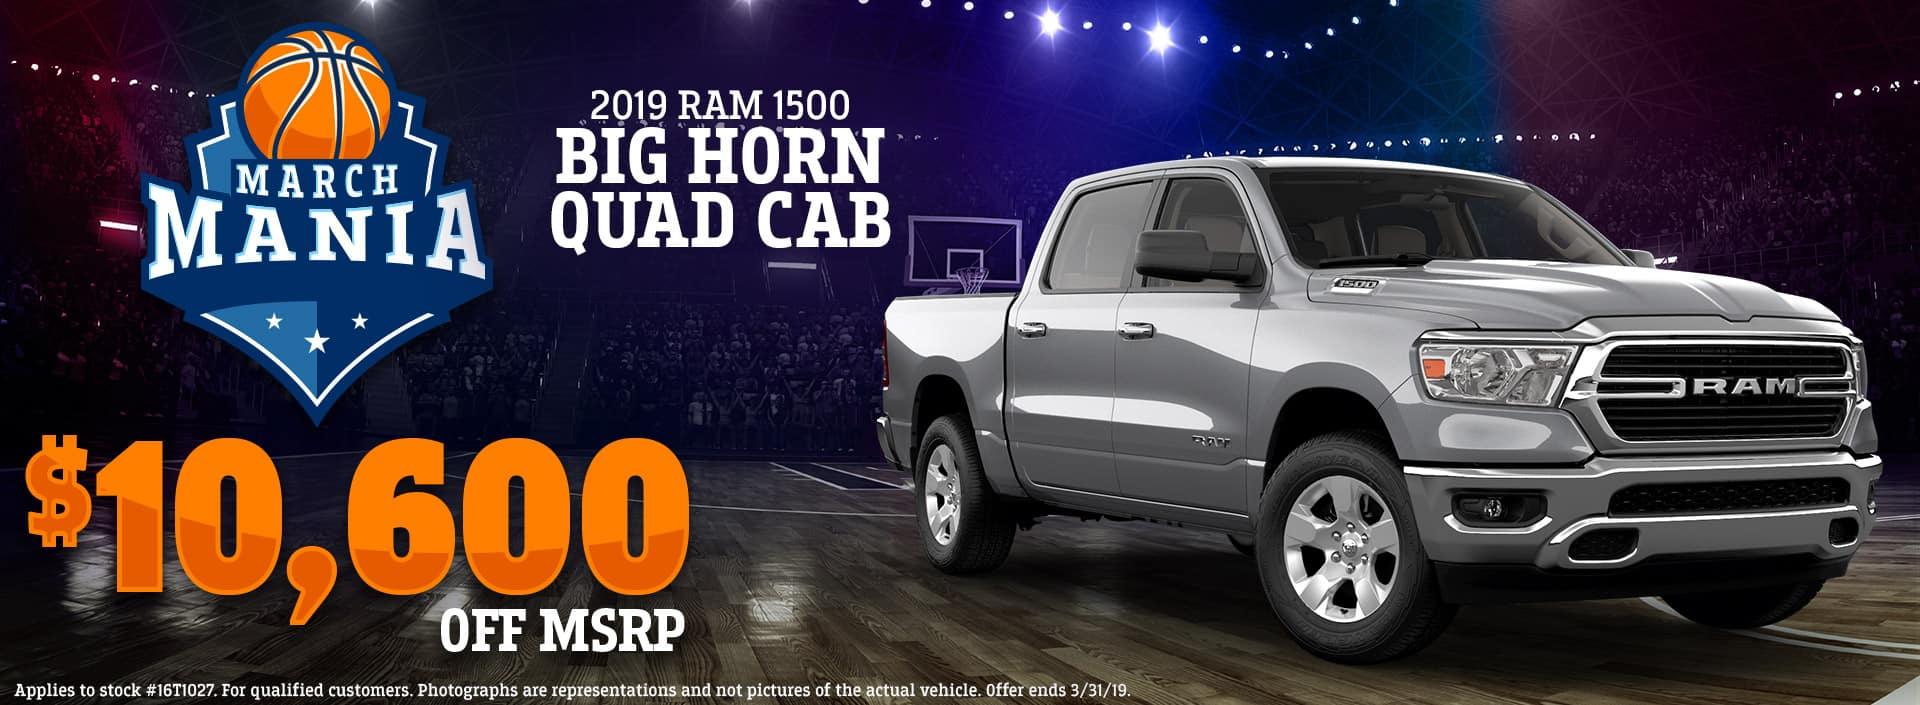 3.19 - 2019 Ram 1500 Big Horn Quad Cab